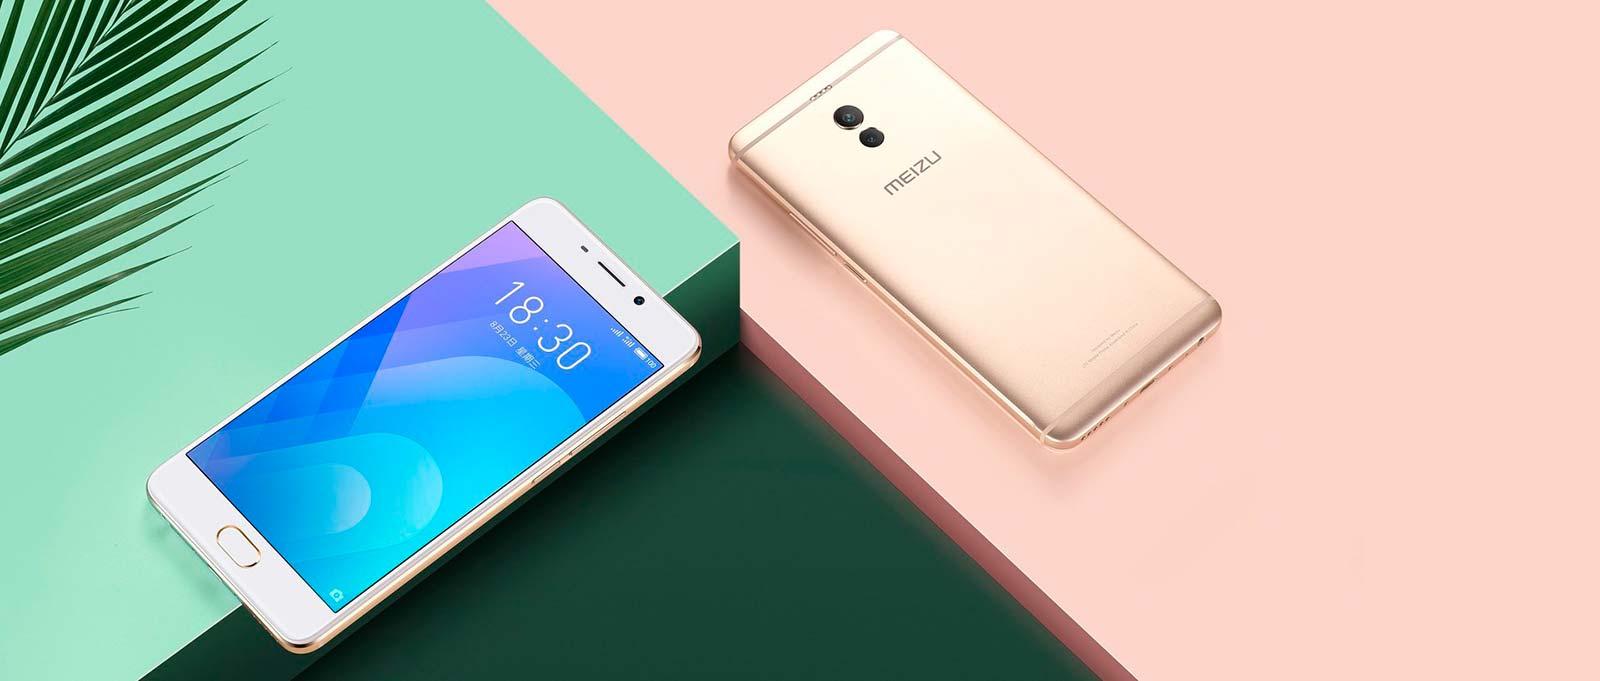 Meizu N6 Note: энергоэффективный экран Sharp IGZO на 5,5-дюйма